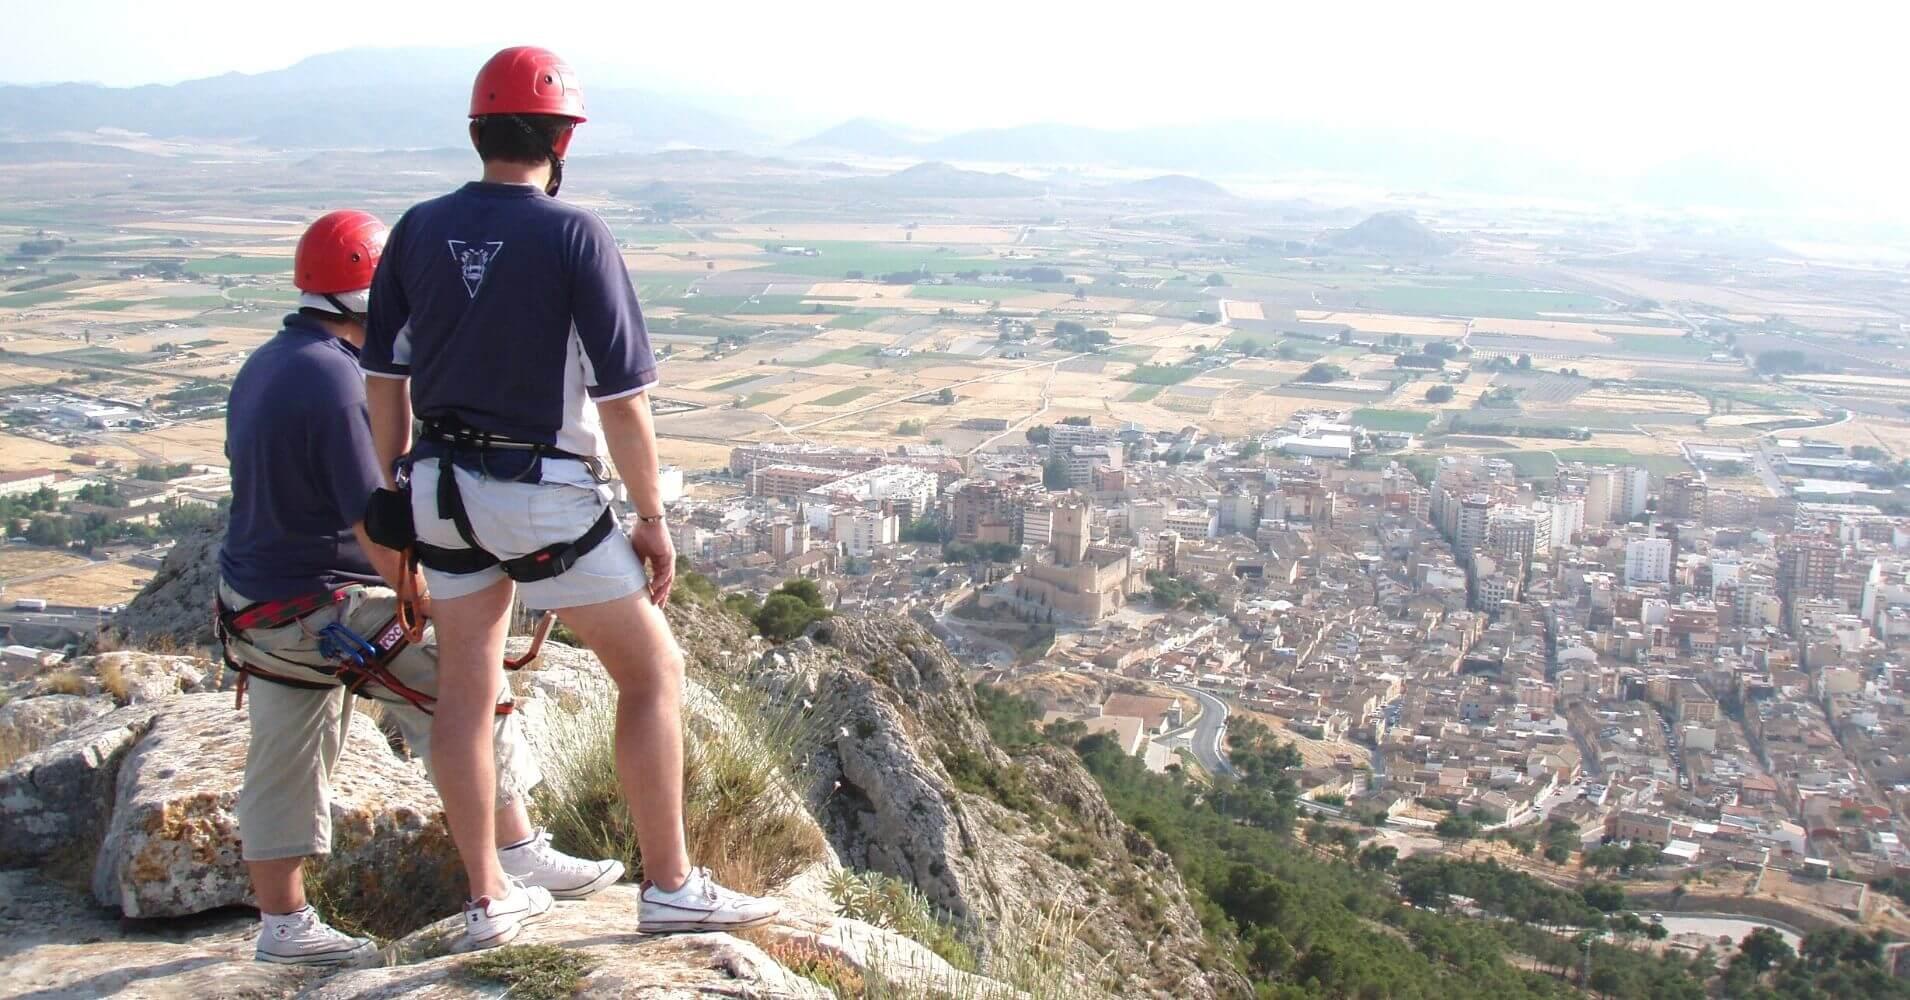 Cumbre de la Ferrata Castillo de Salvatierra. Villena, Alicante. Comunidad Valenciana.